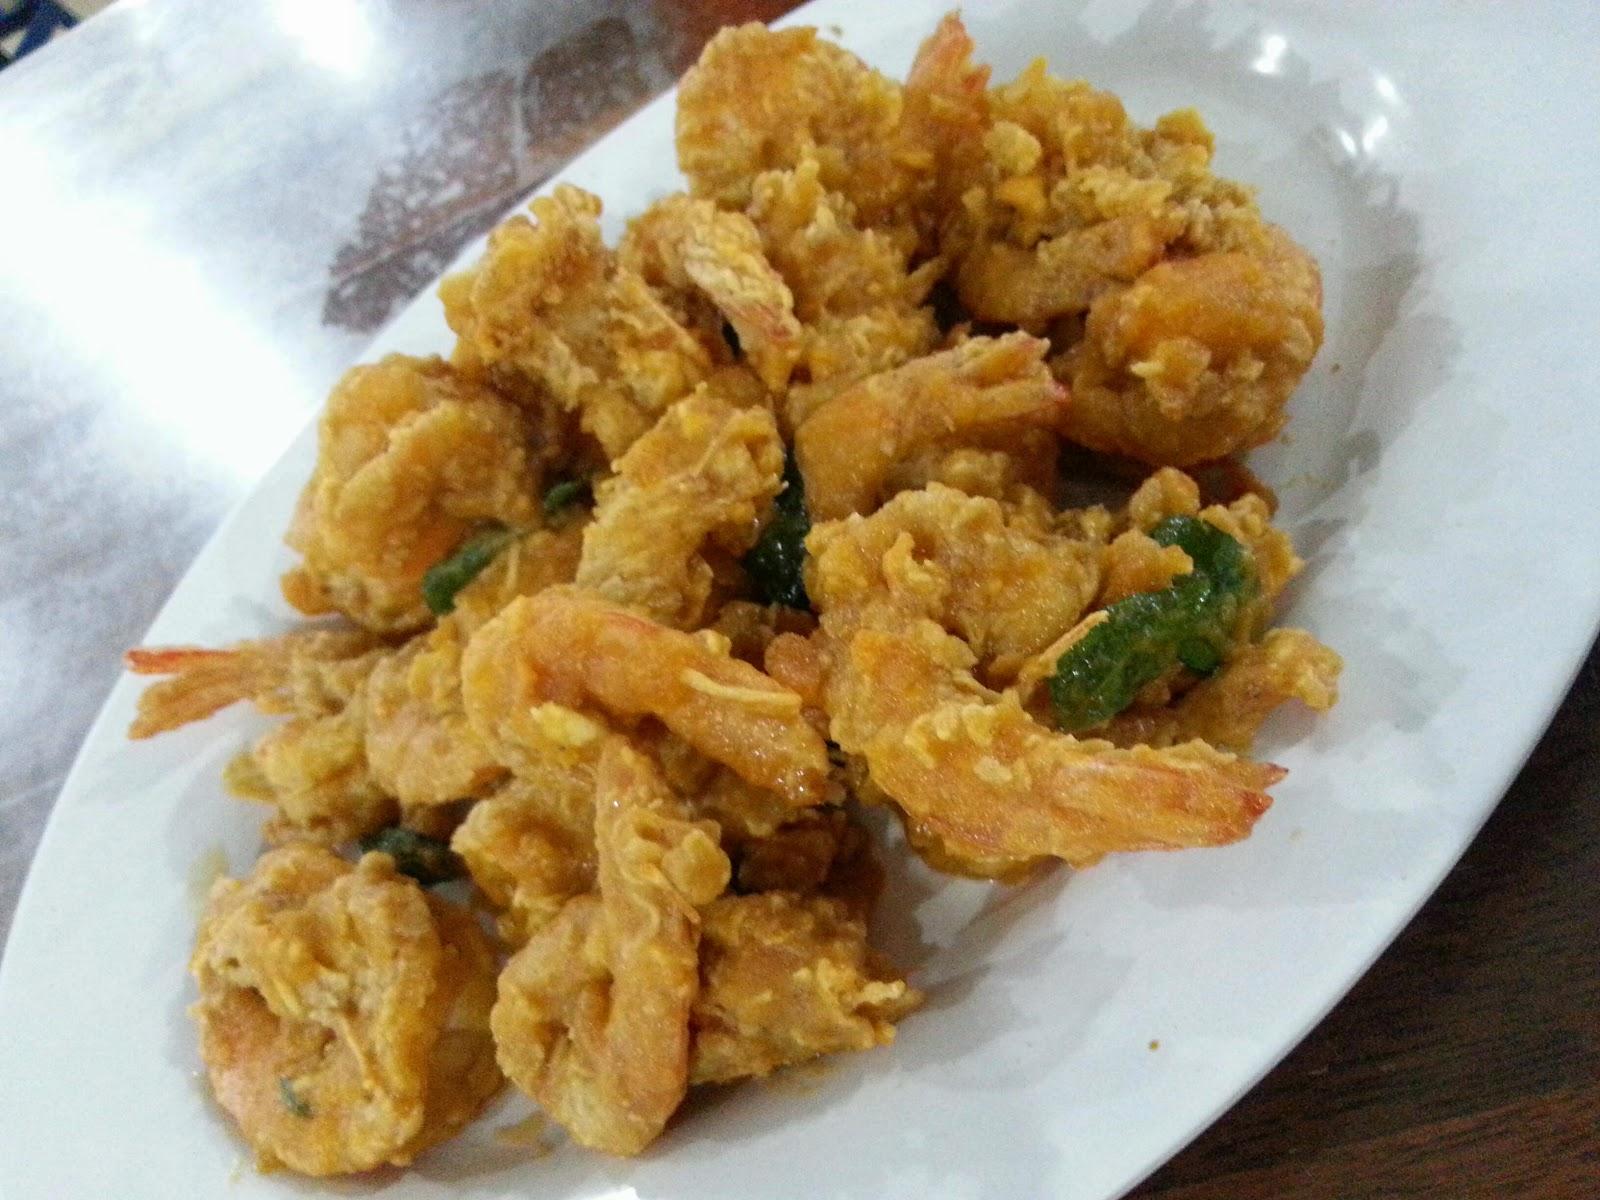 onetwotreat: Aroma Sop Seafood, Muara Karang Jakarta